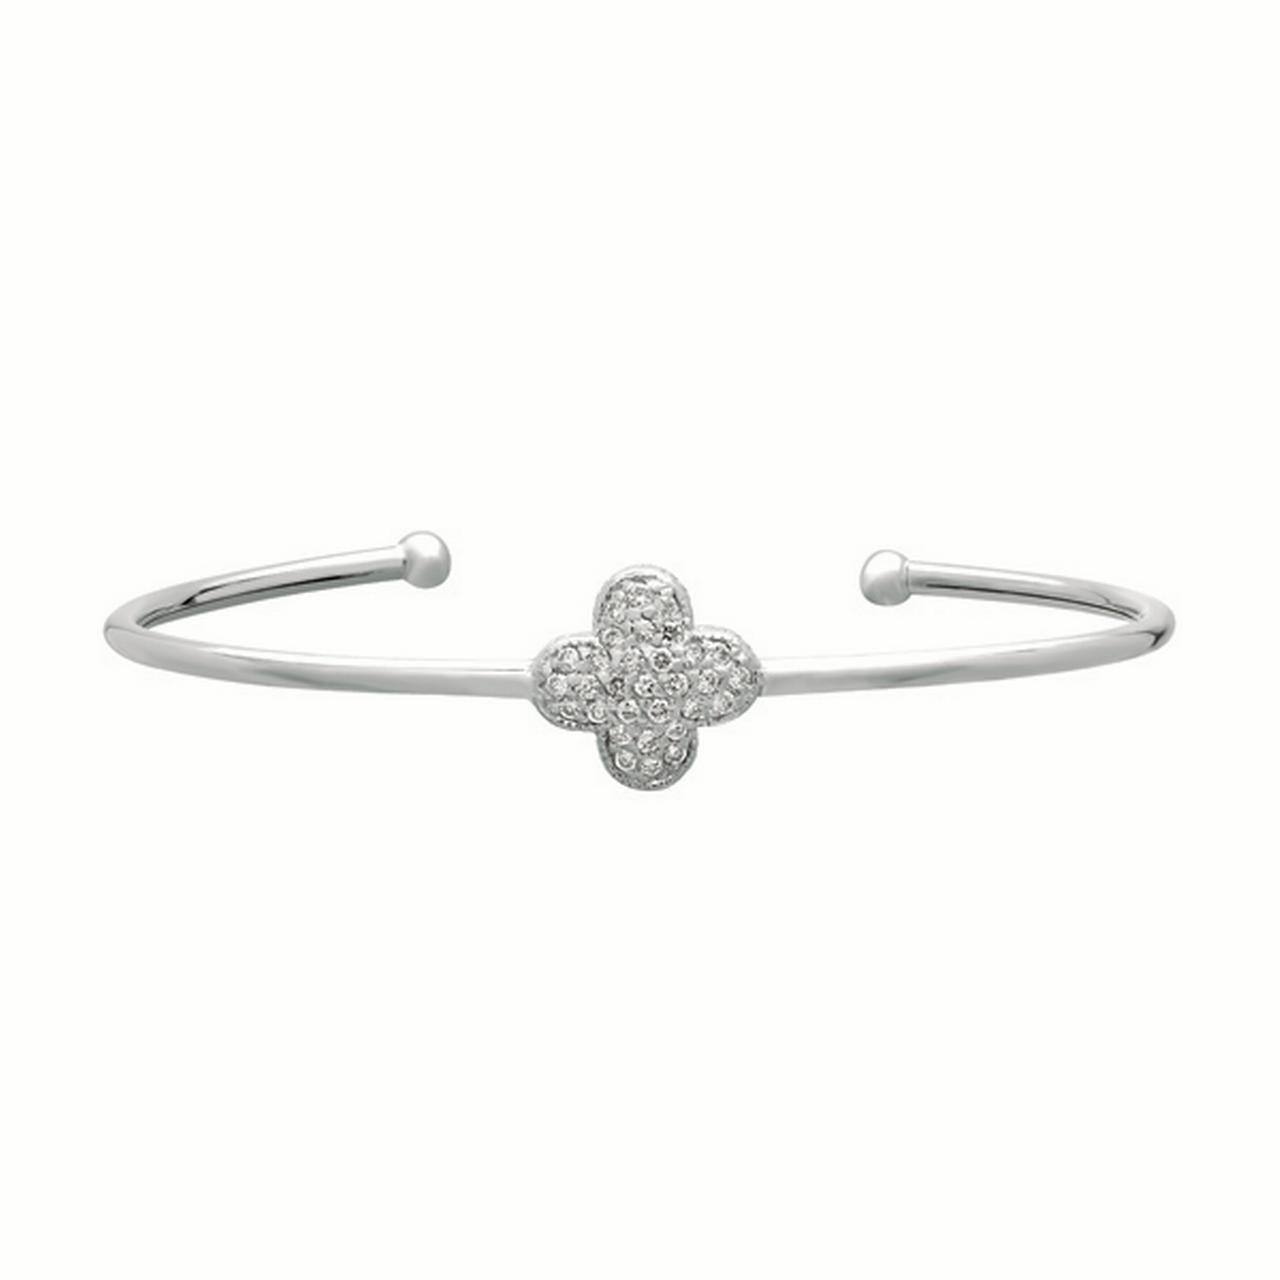 Diamond Jewelry, Clover Cuff Bracelet, 14 Karat White Gold, Diamond 0.37 Carats, 7 Inches Around, Open Cuff Closure by Diamond Jewelry